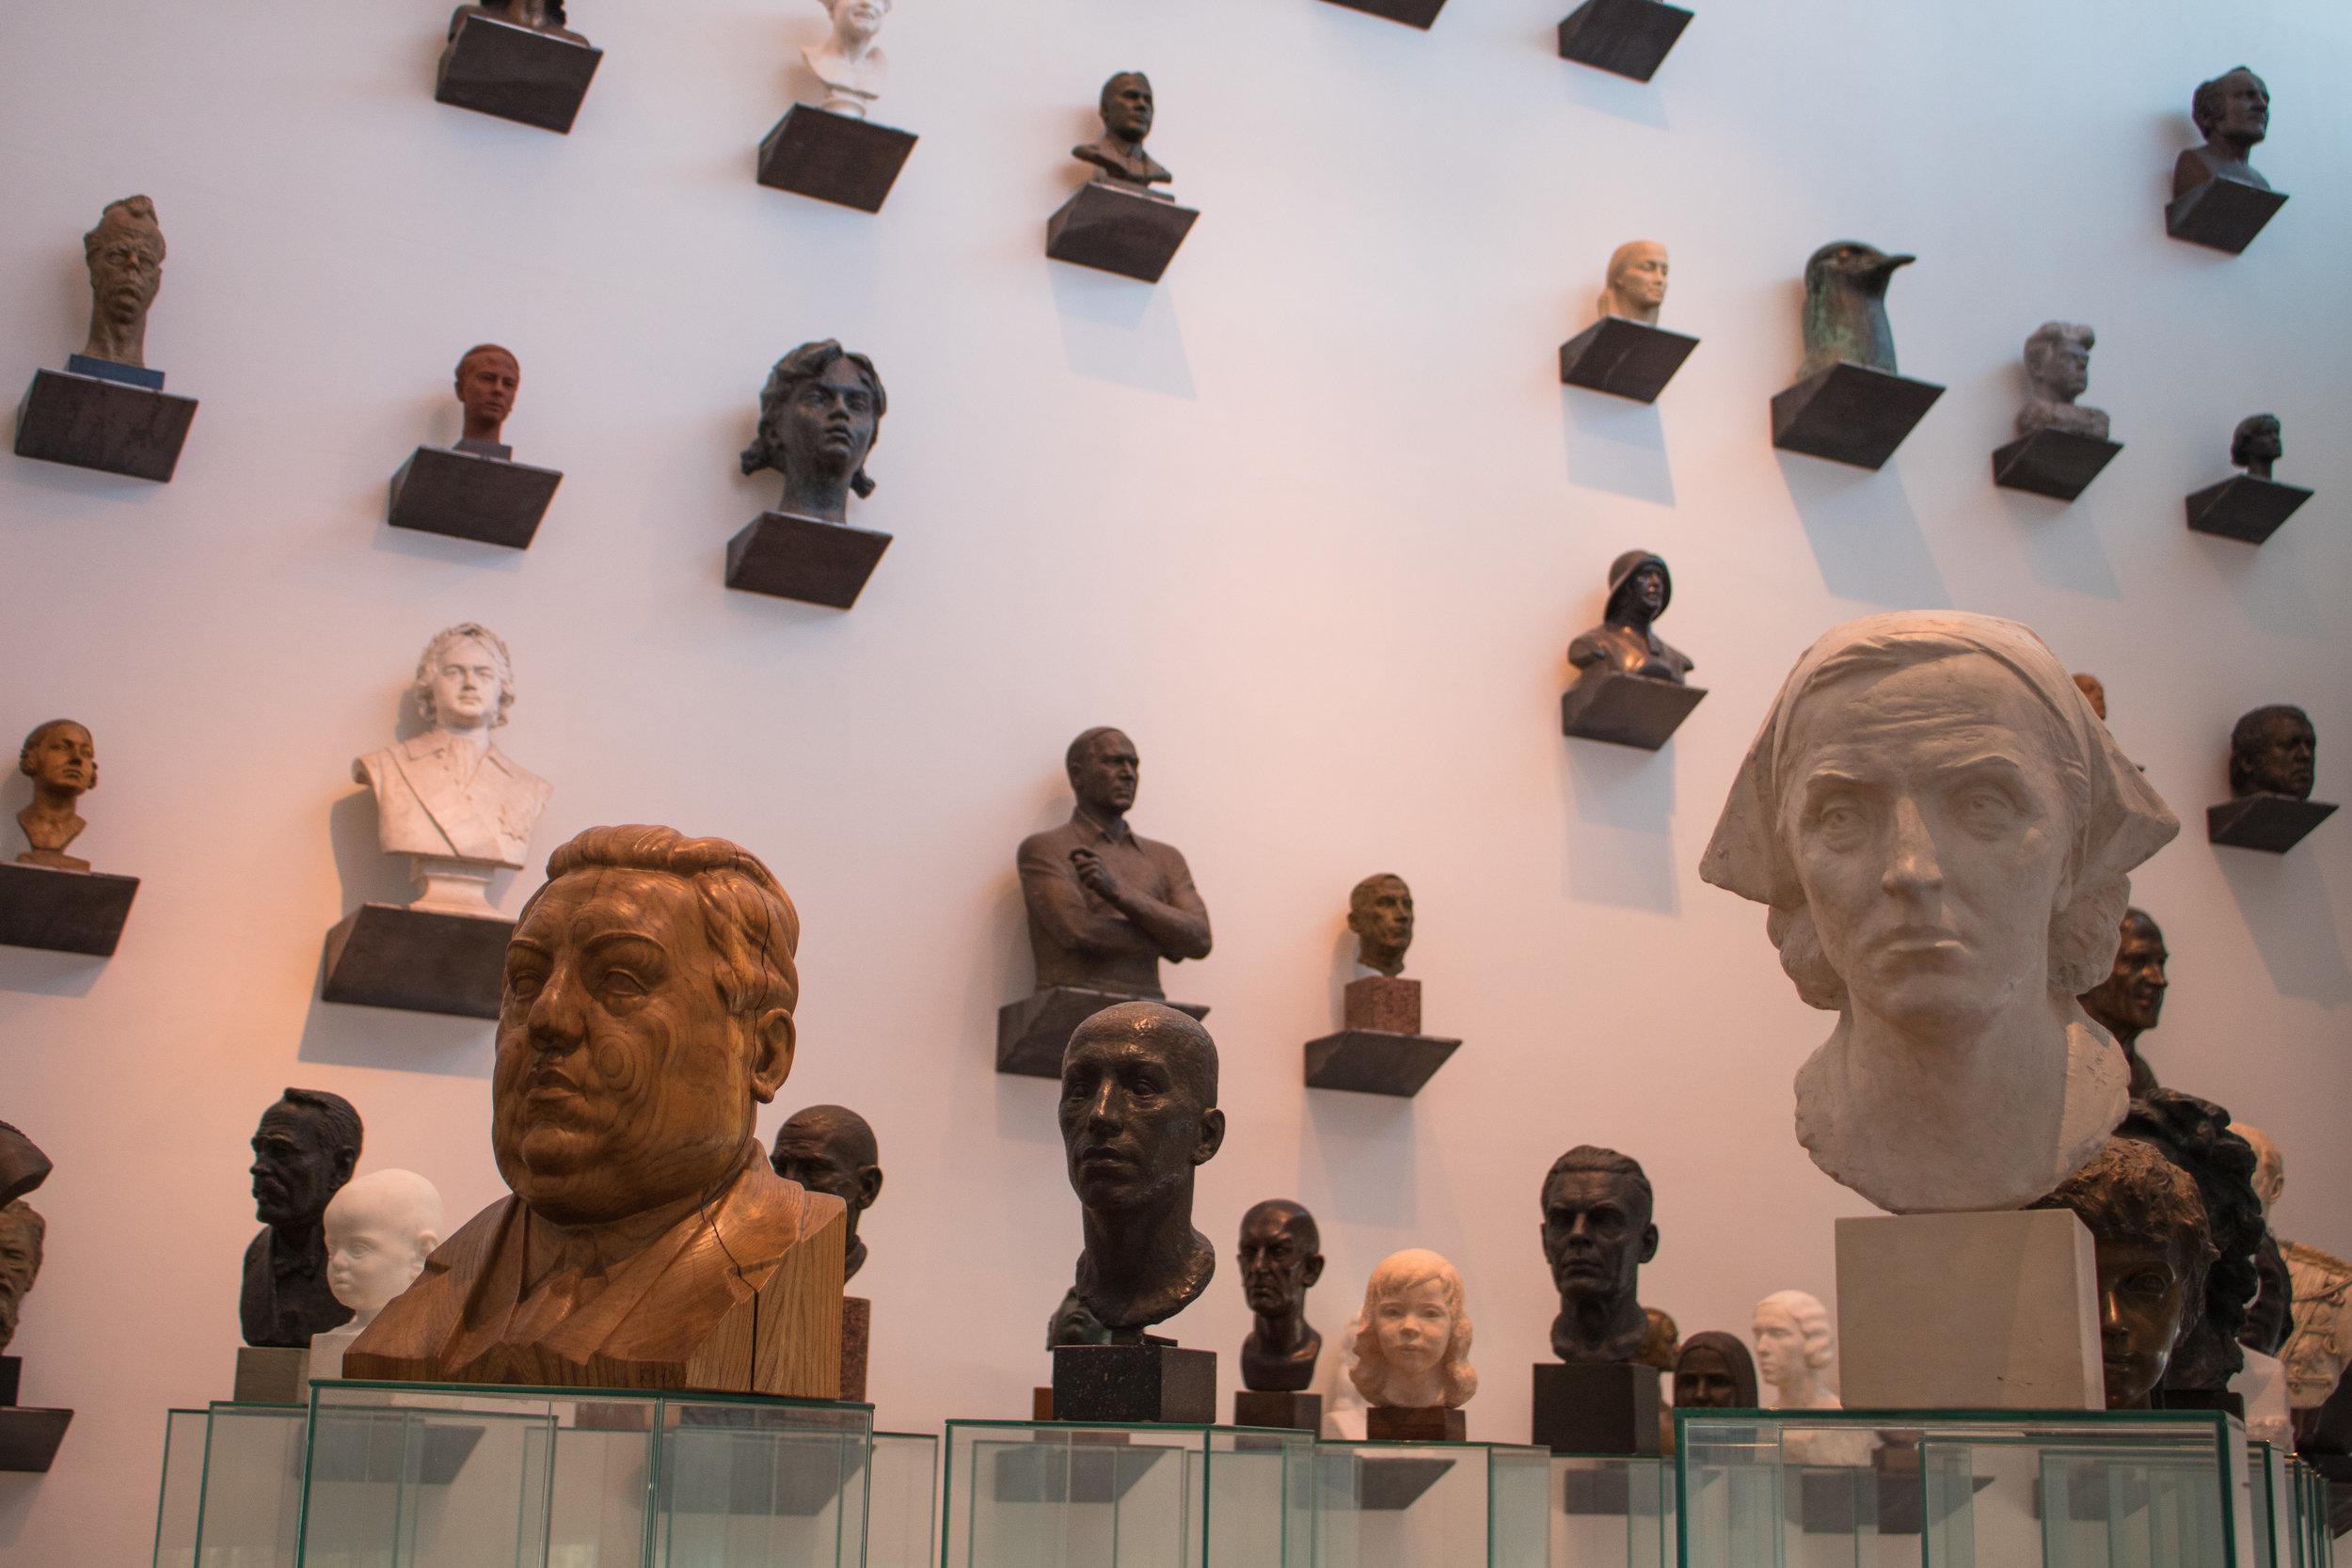 kumu art museum tallinn estonia exhibit.jpg